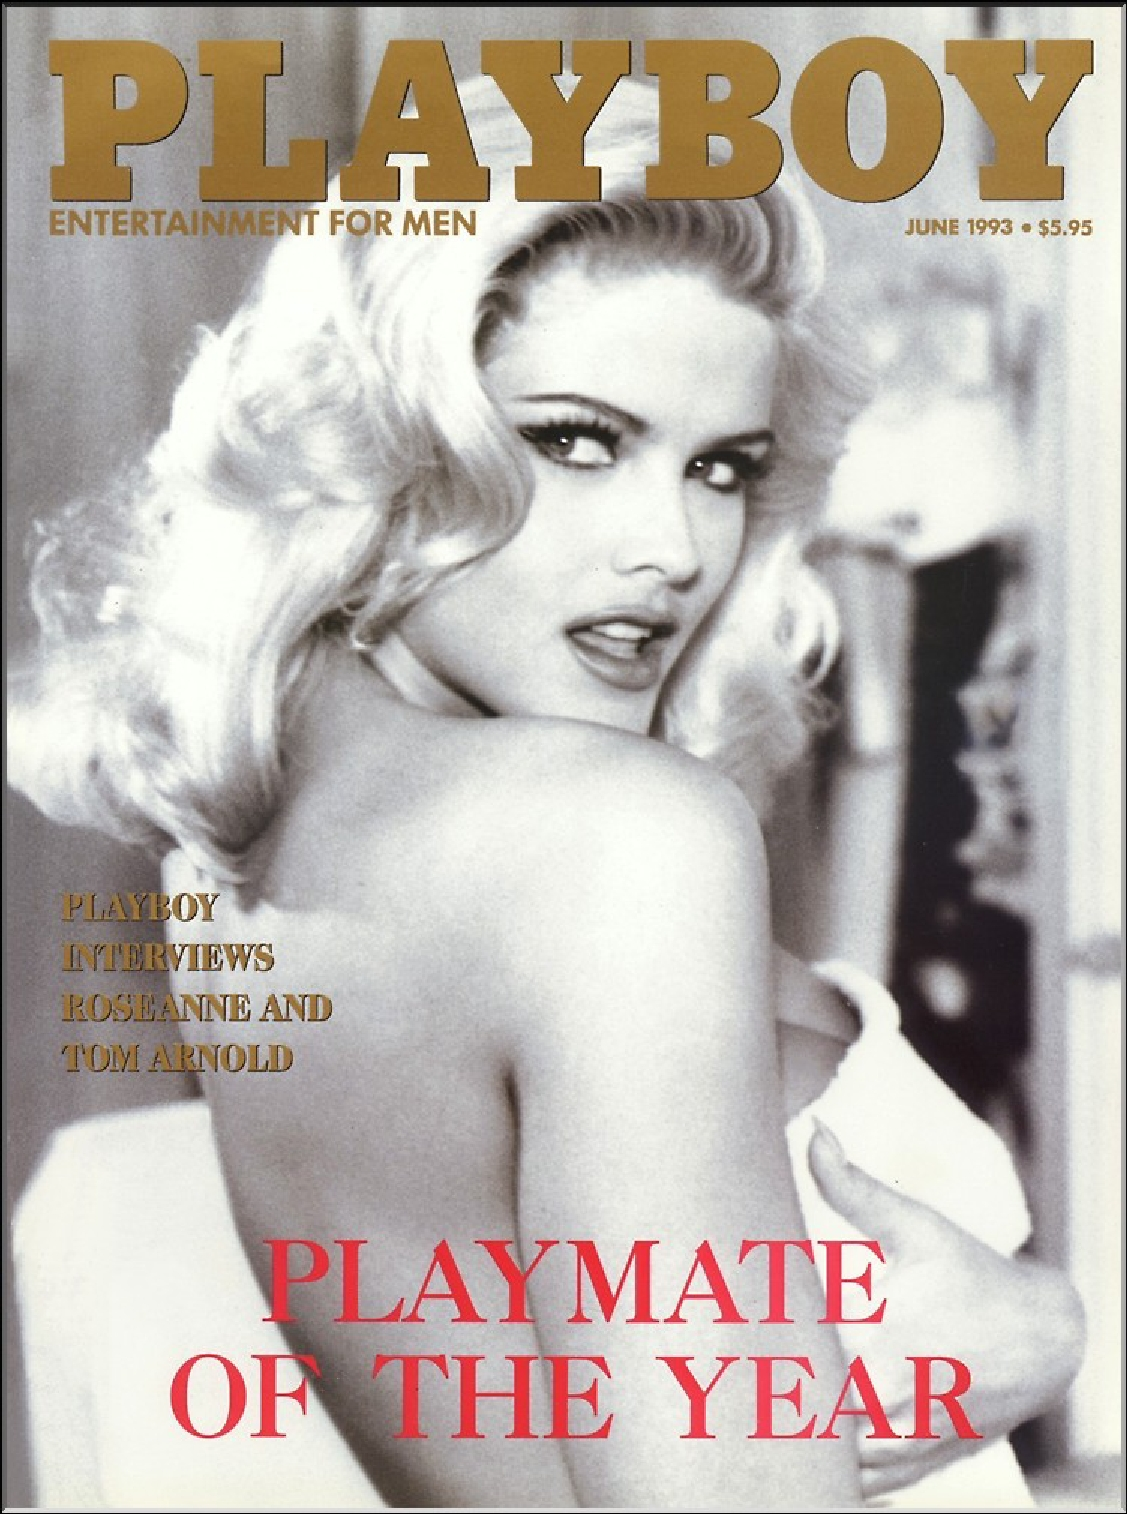 http://3.bp.blogspot.com/-gvbWoXFM1j4/Taina8RcNvI/AAAAAAAAF80/E32ZNbWYWJI/s1600/67074_Playboy_-_1993_06_ANS_23-310000_123_203lo.jpg